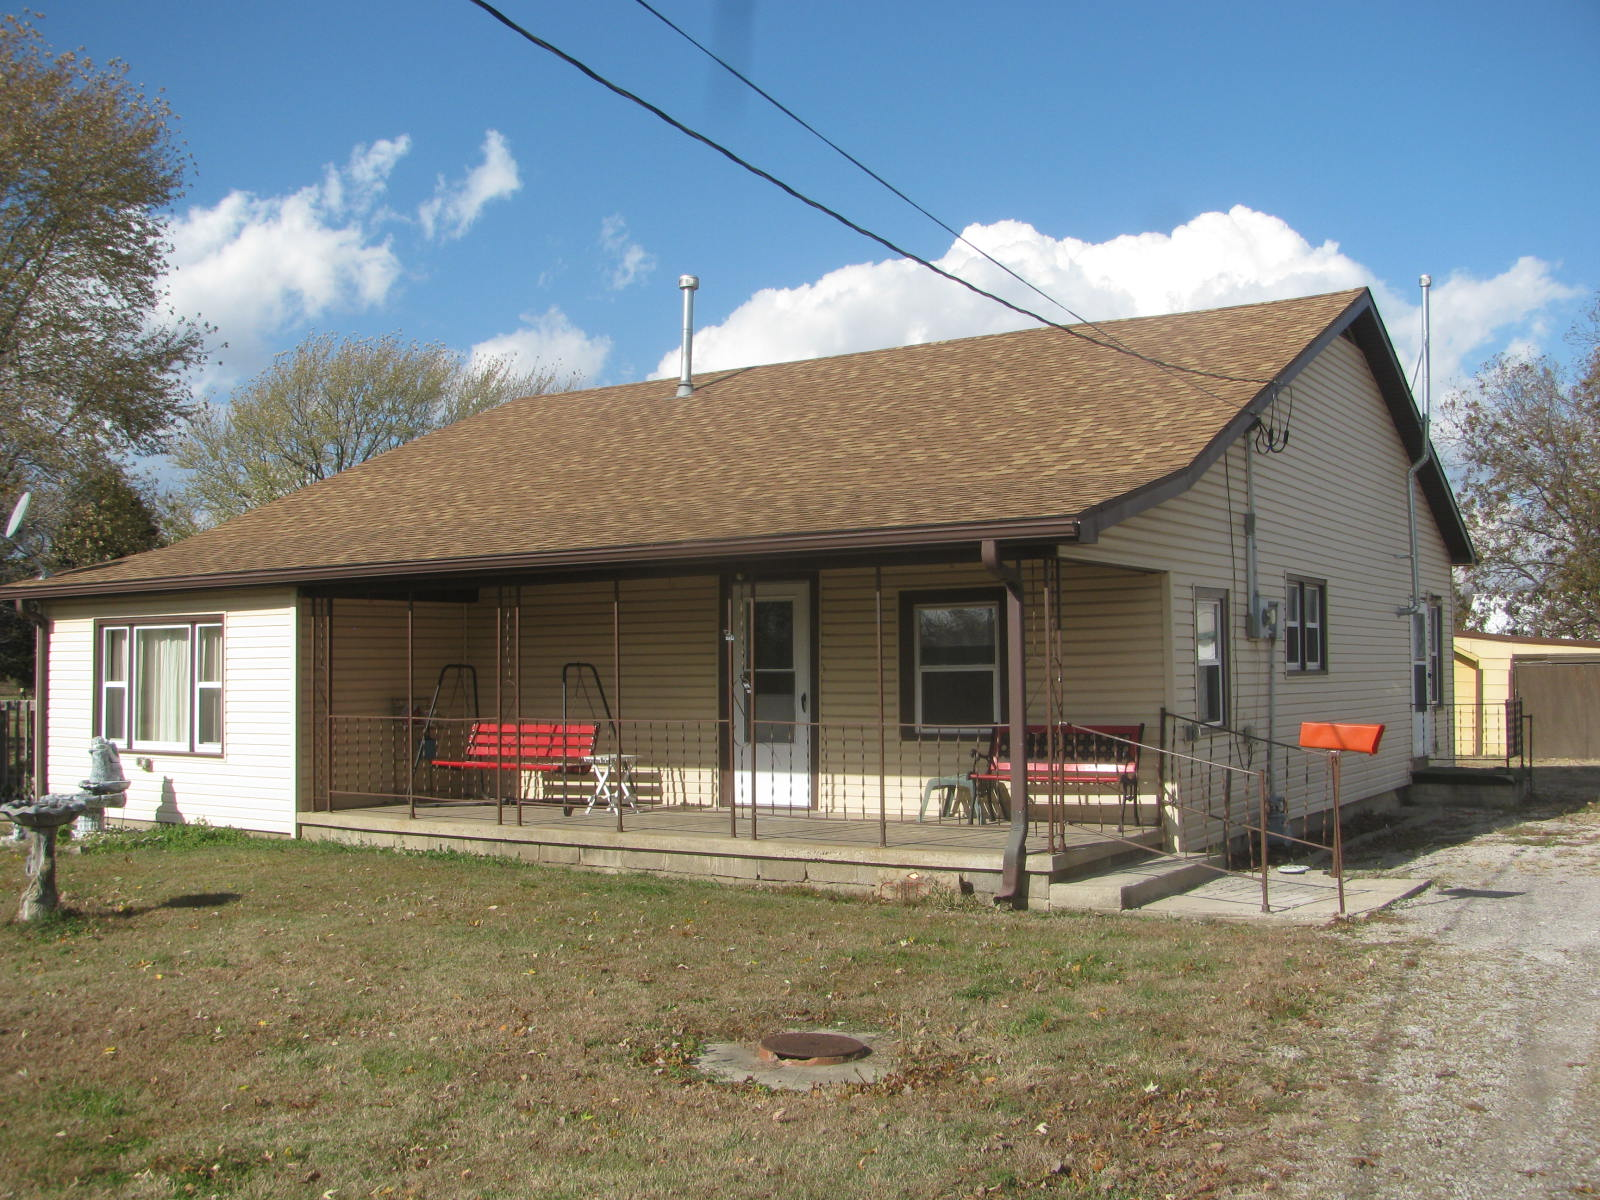 206 South, Liberal, Missouri 64672